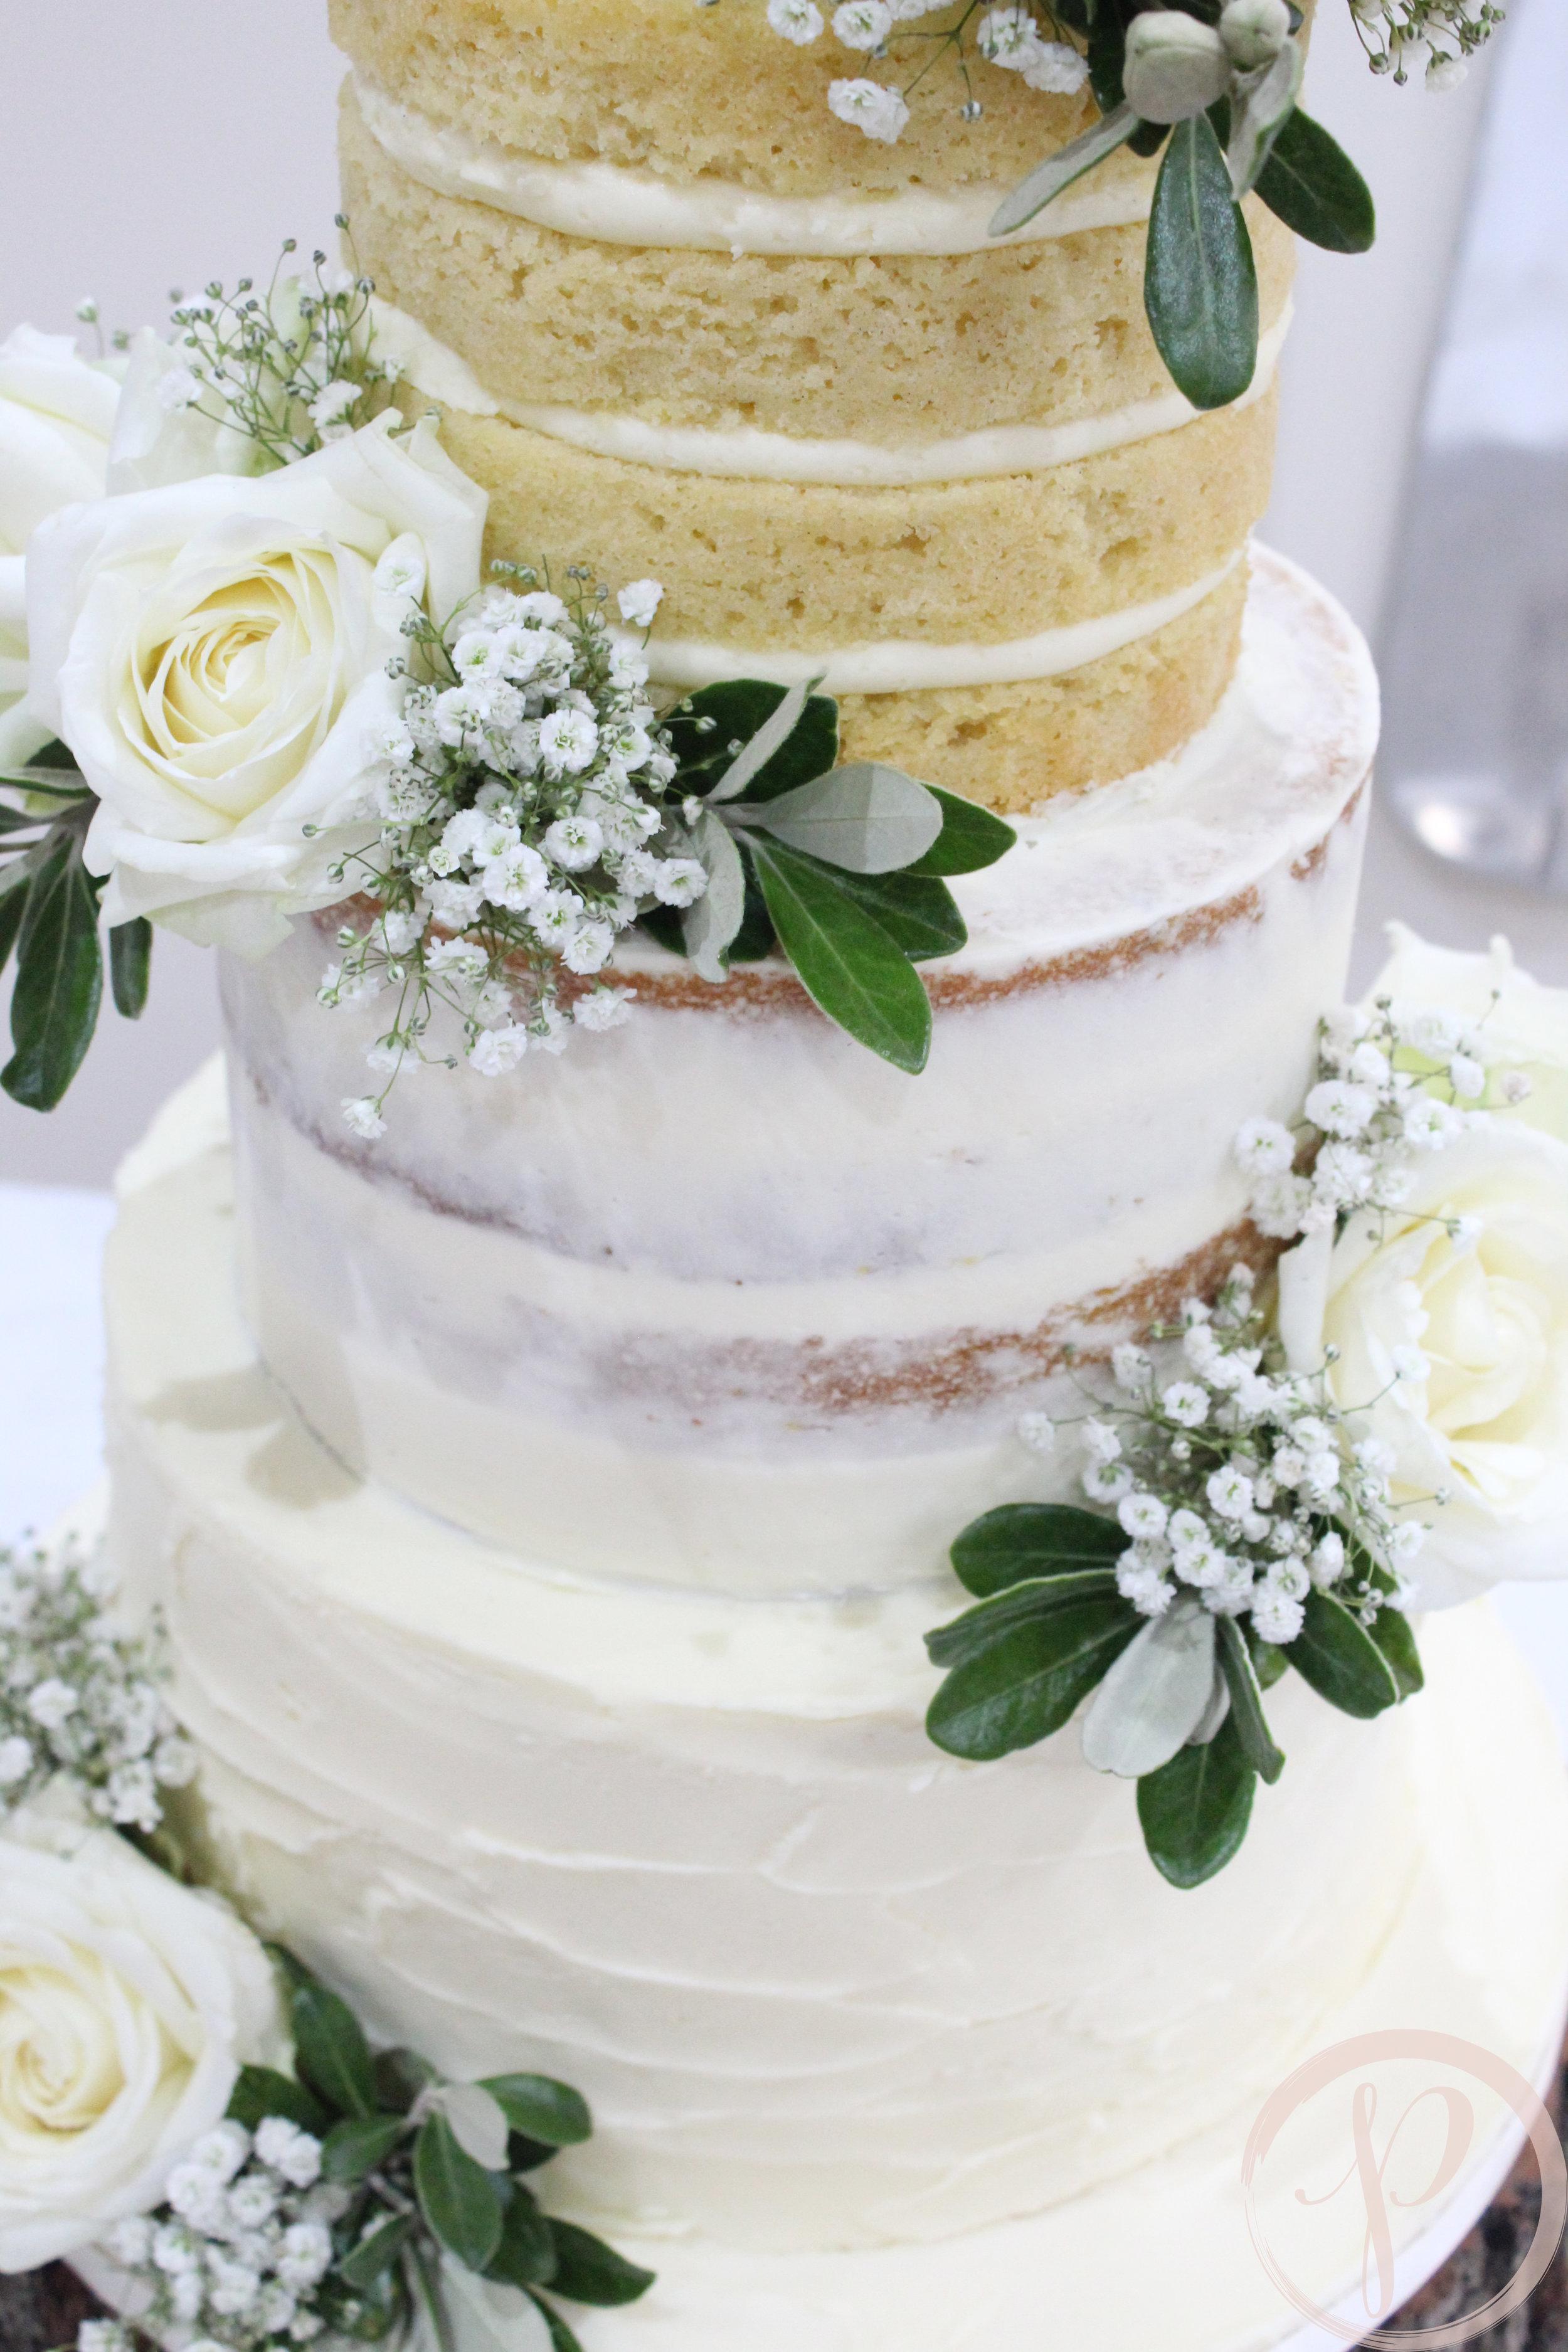 gradiented naked wedding cake close up.jpg